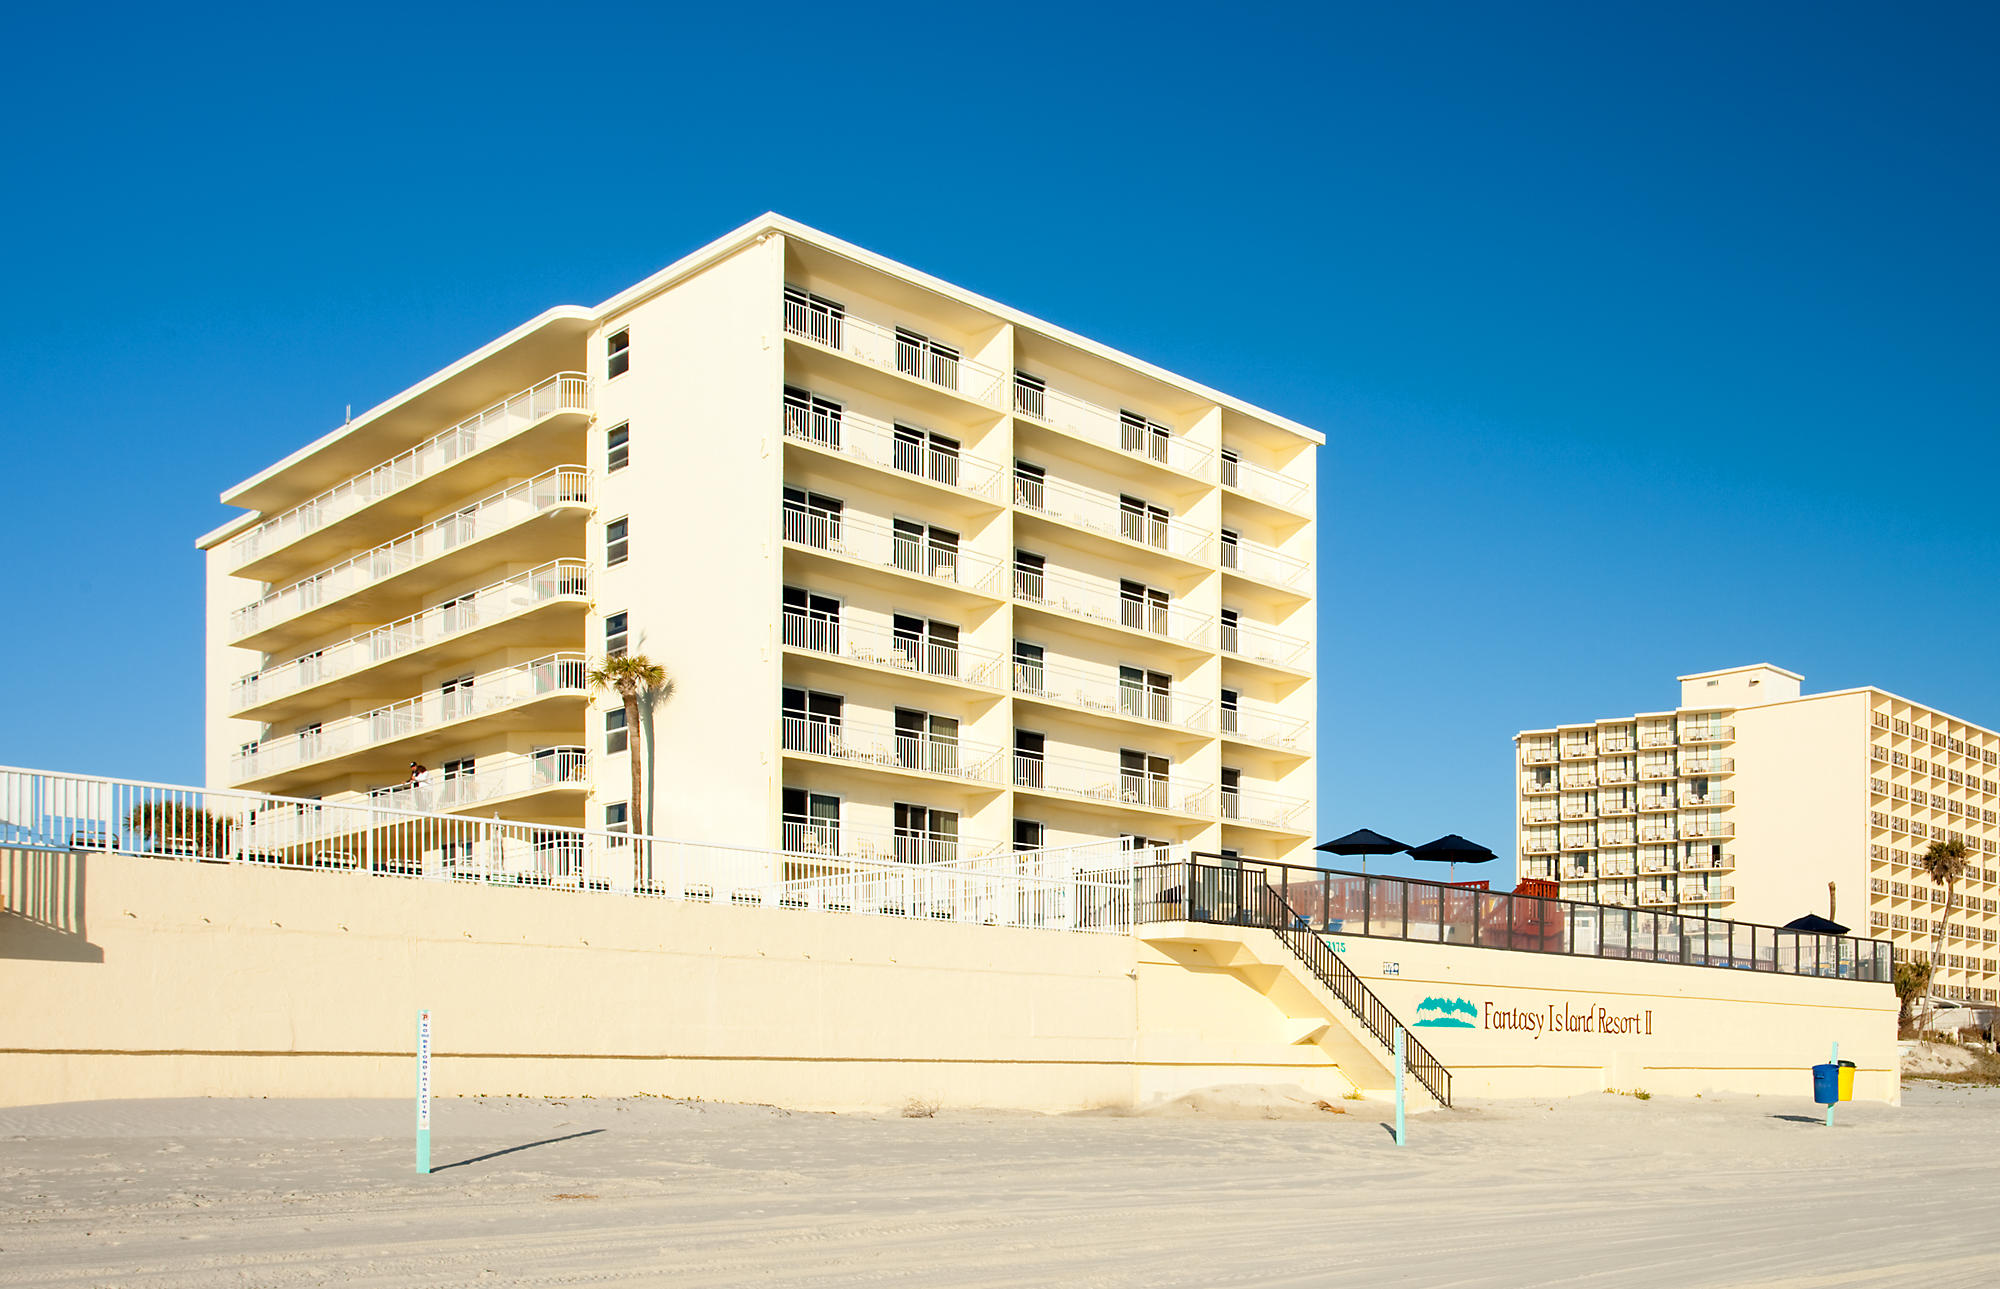 Fantasy Island Resort Ii Daytona Beach Florida Bluegreen Vacations